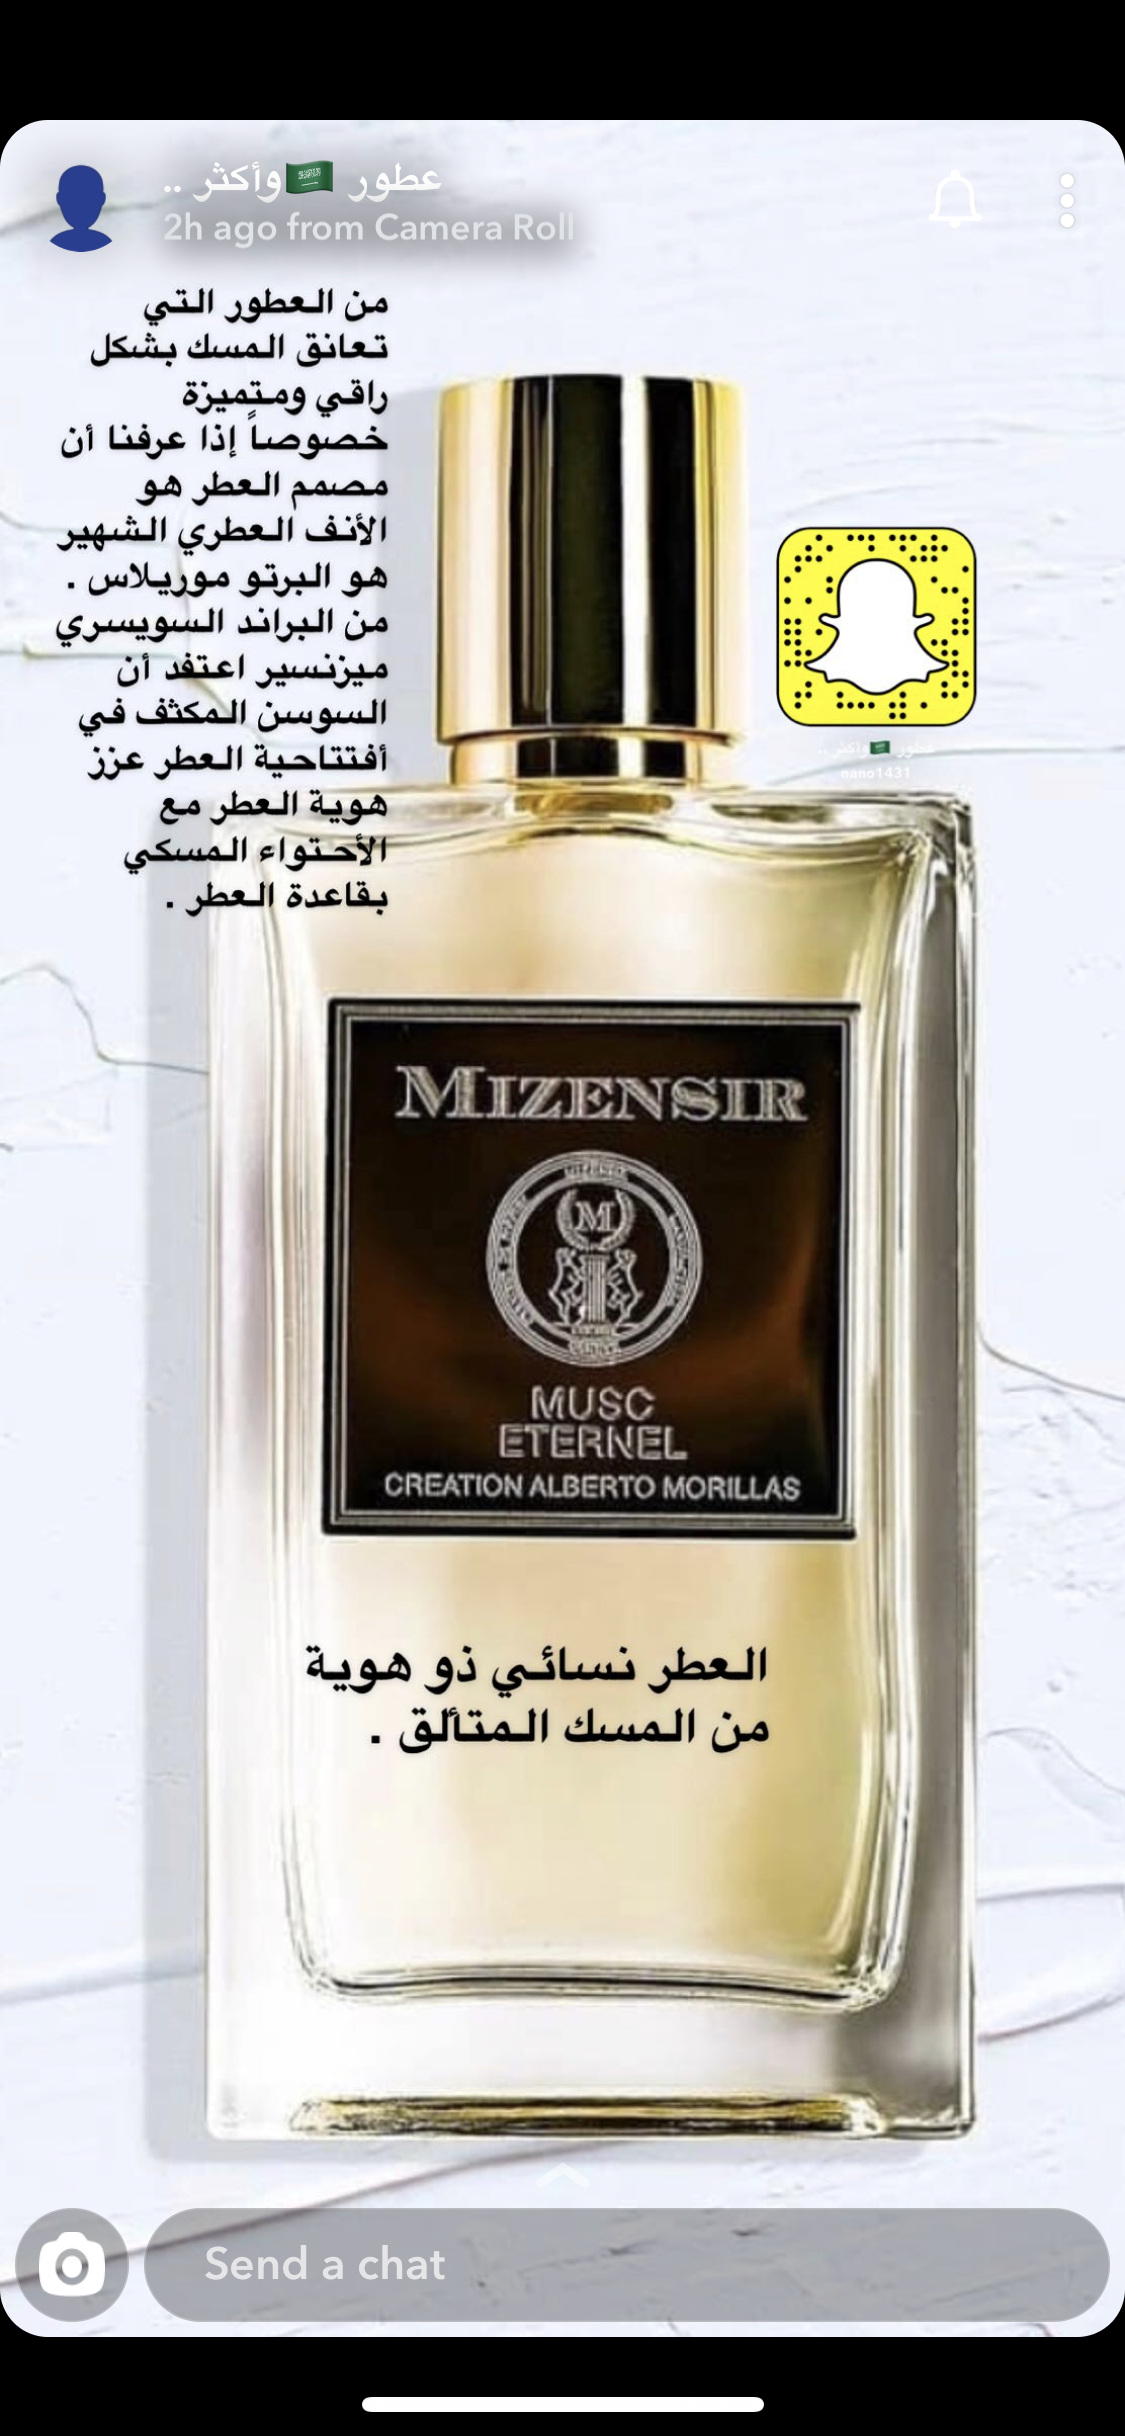 Pin By Alrayssi On عطور فرنسية In 2020 Hair Perfume Skin Care Women Perfume